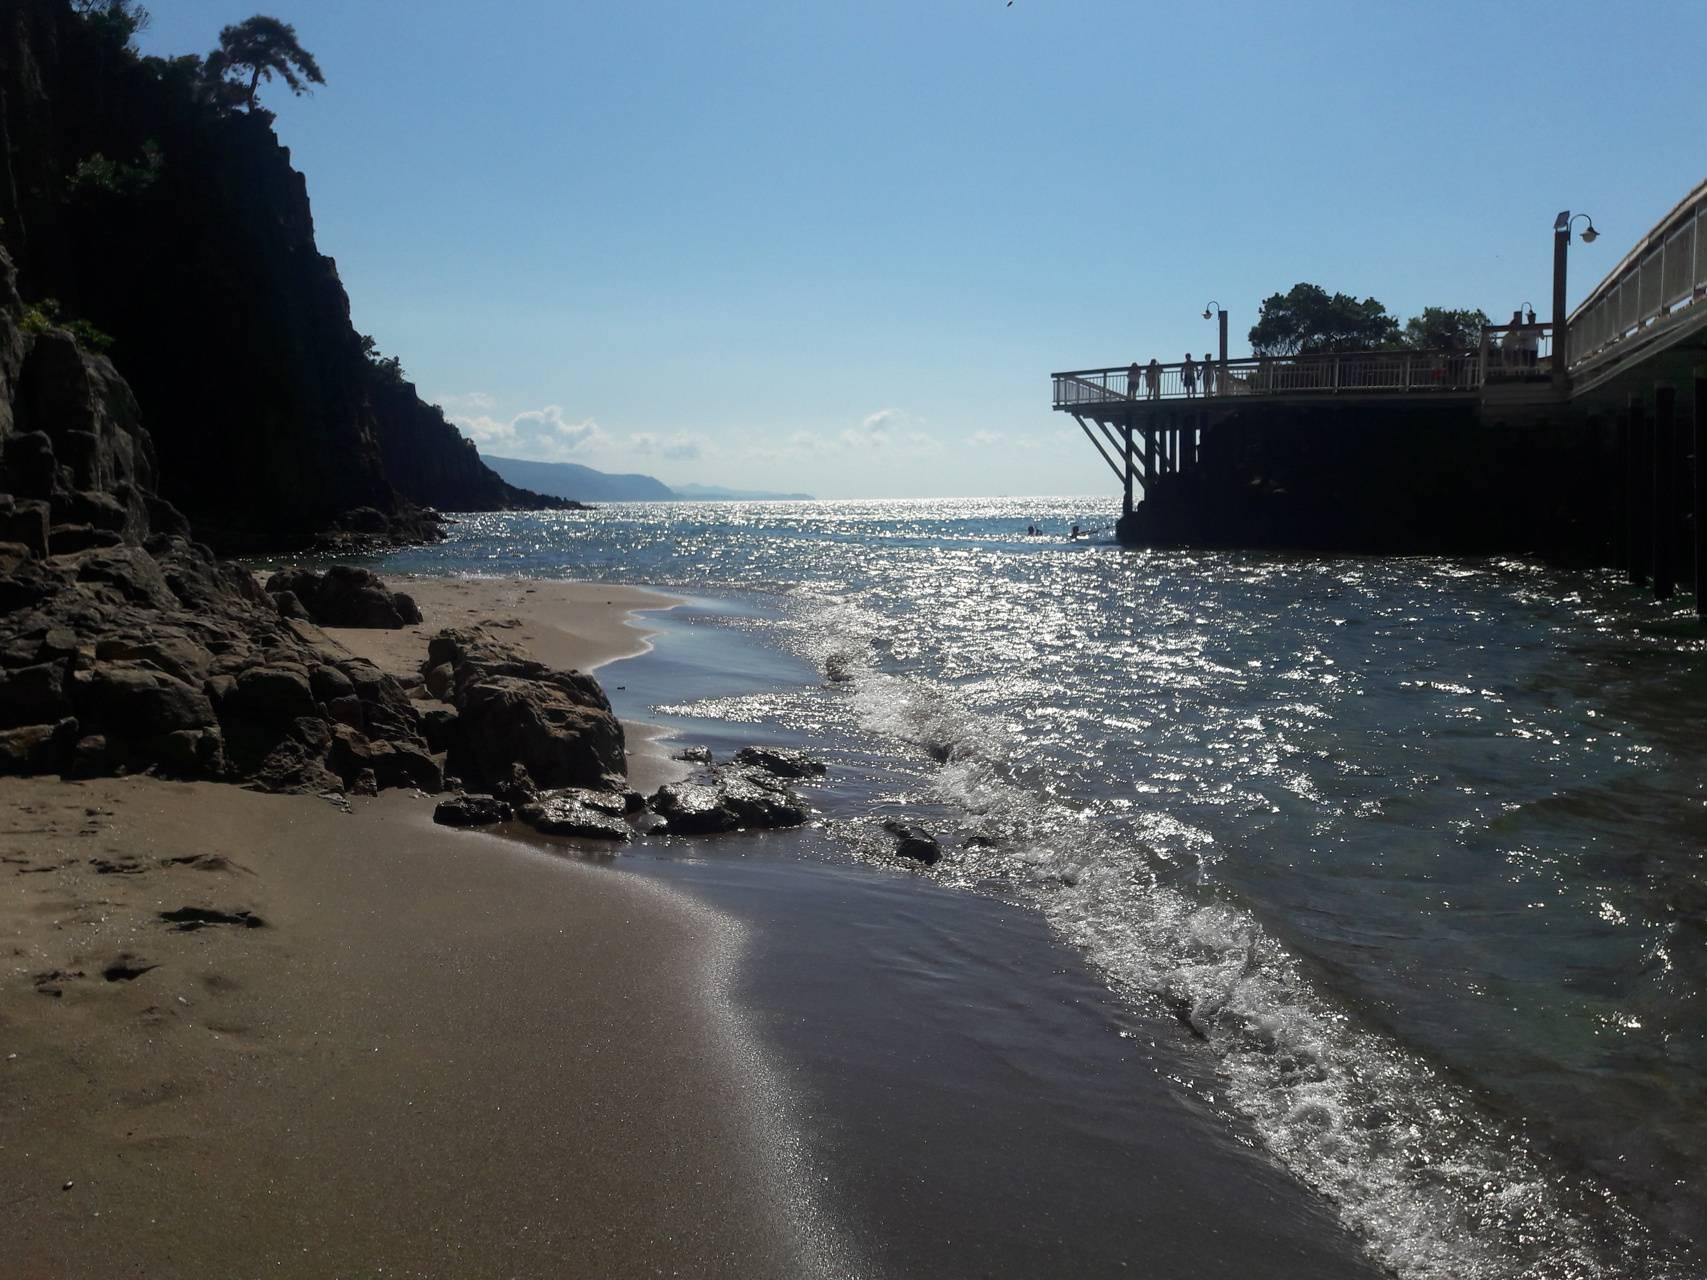 Deniz kum gunes